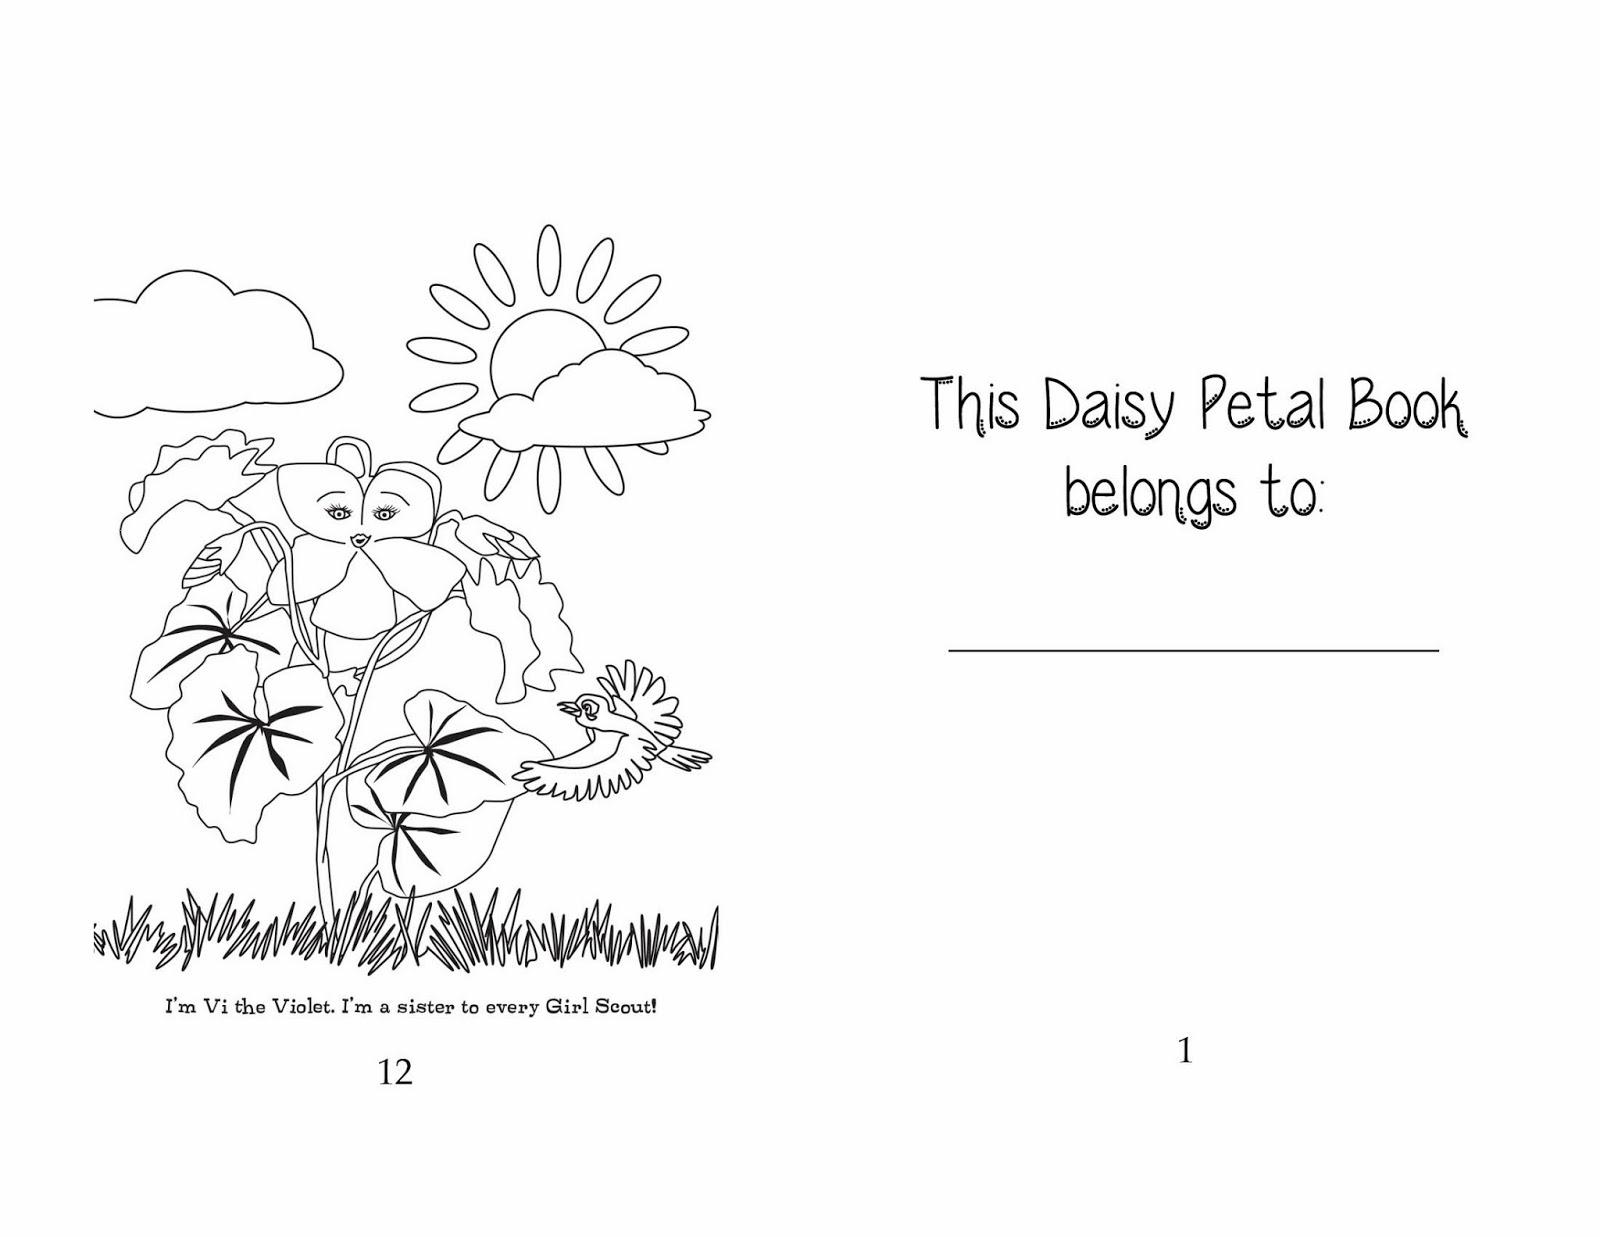 Daisy petals book for Daisy petal coloring page